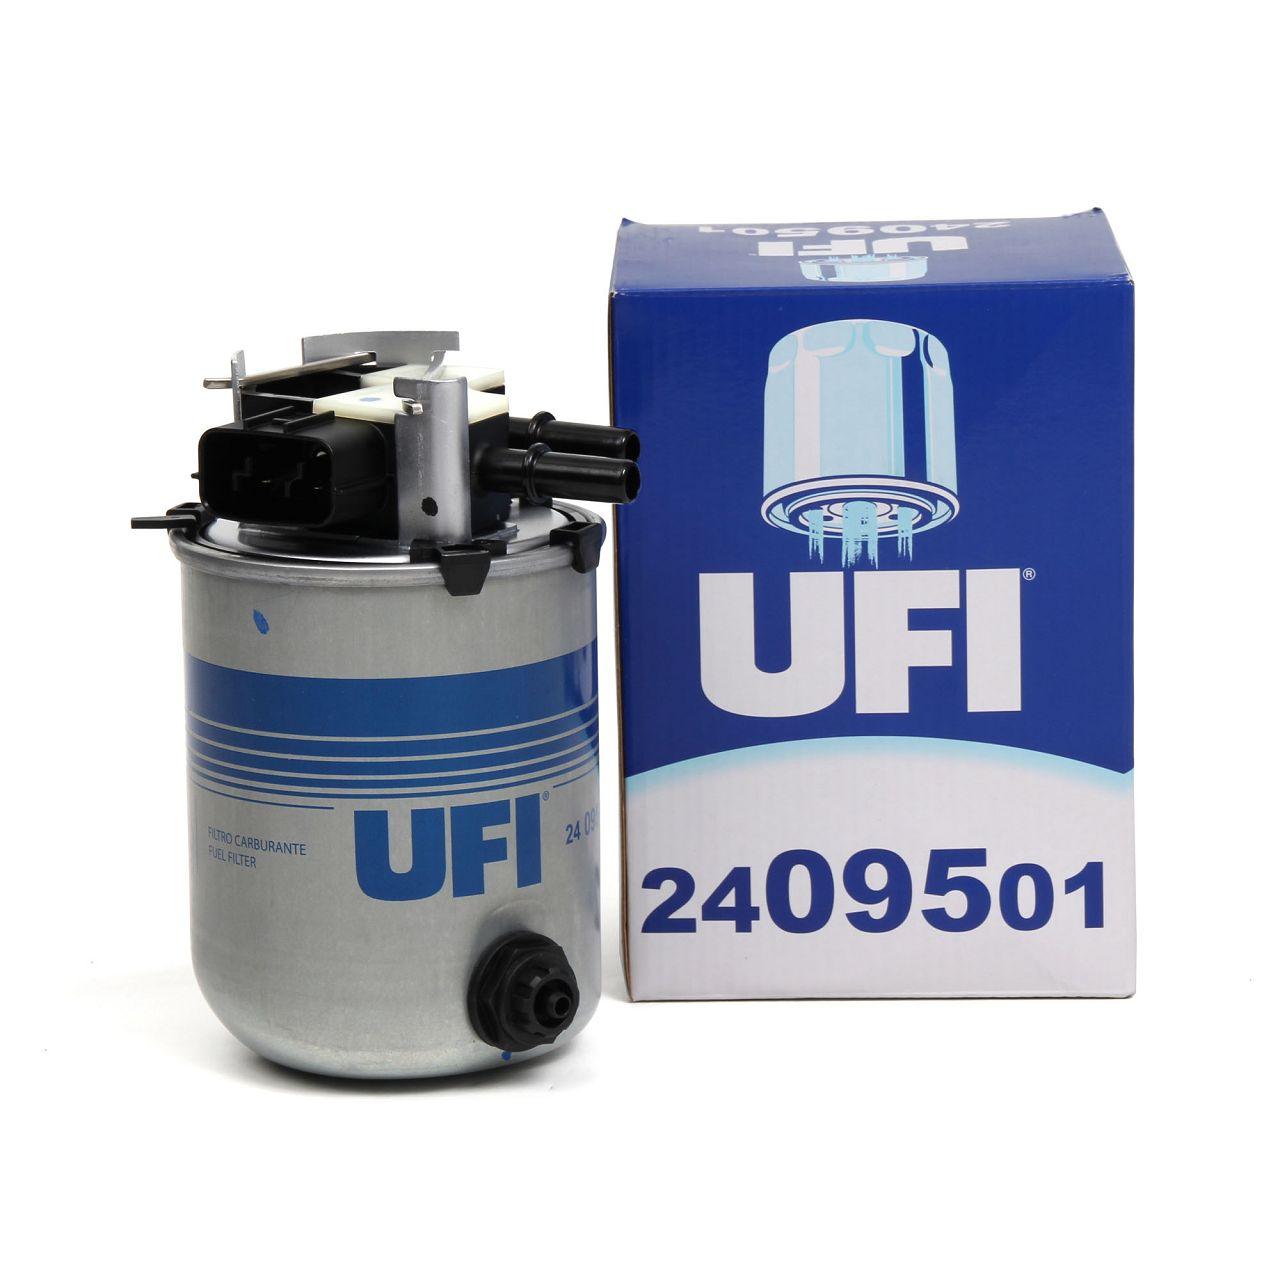 UFI Kraftstofffilter Dieselfilter für NISSAN QASHQAI X-TRAIL RENAULT KADJAR